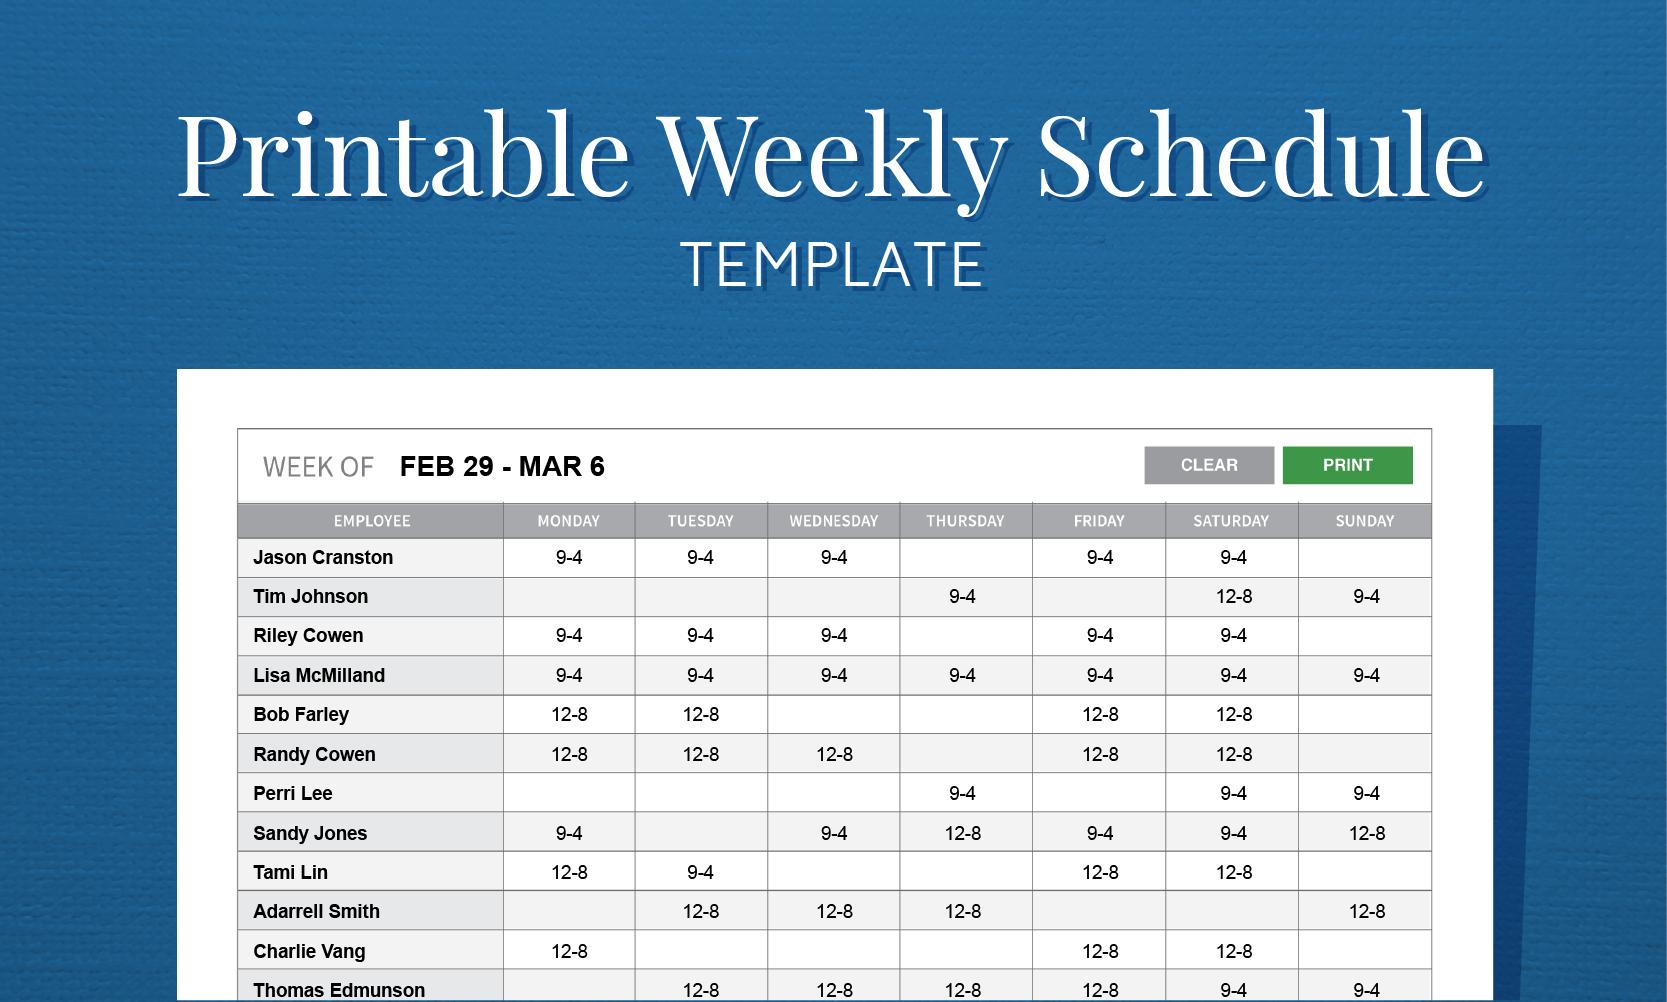 Free Printable Weekly Work Schedule Template For Employee Scheduling - Free Printable Weekly Work Schedule